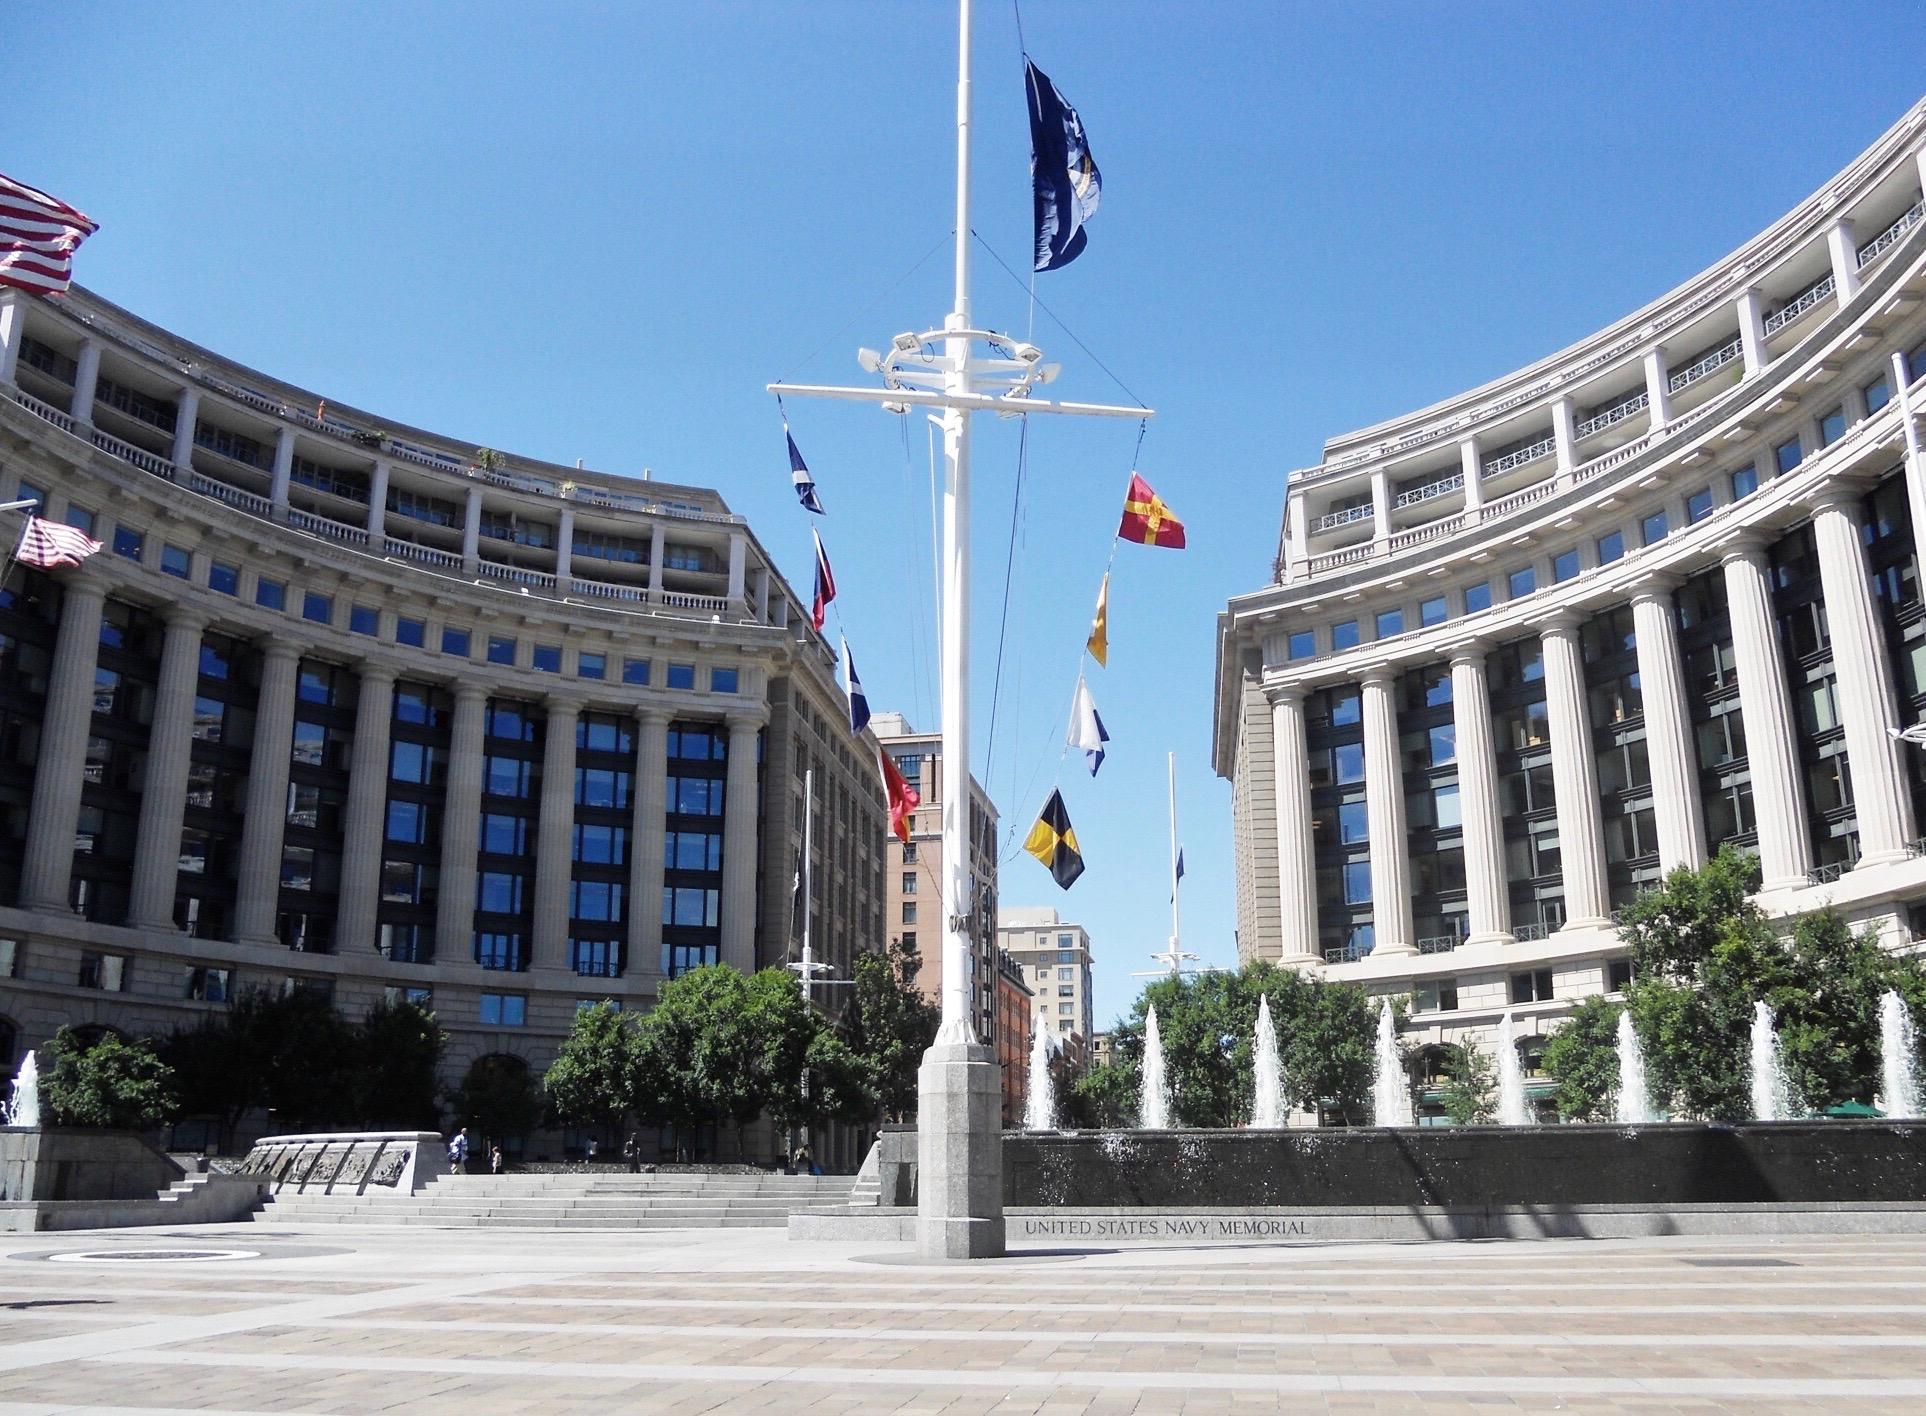 US Navy Memorial Plaza